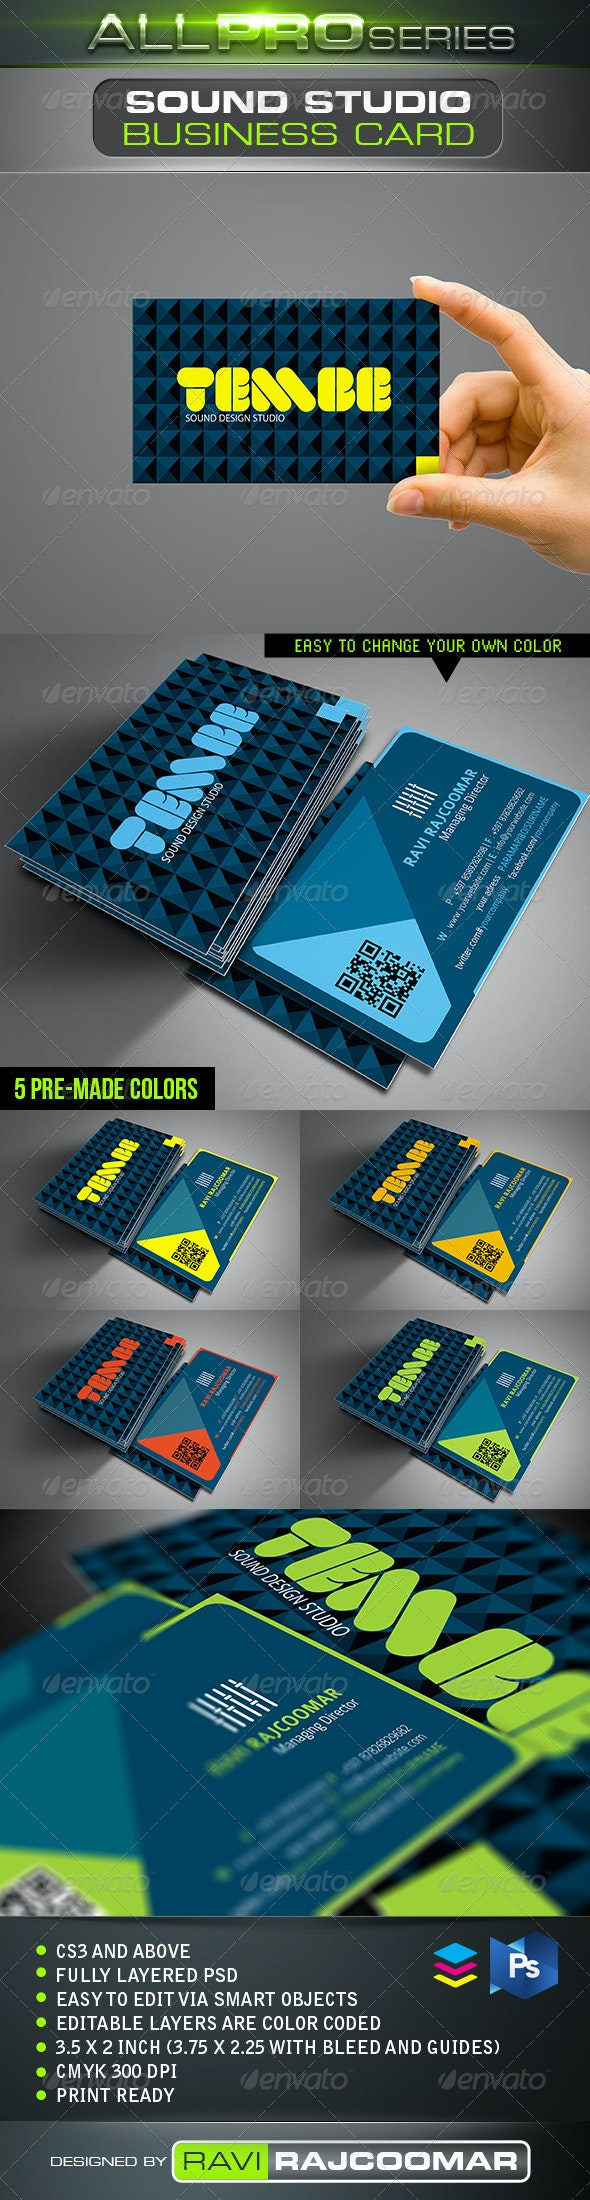 Sound Studio Business Card - Business Cards Print Templates